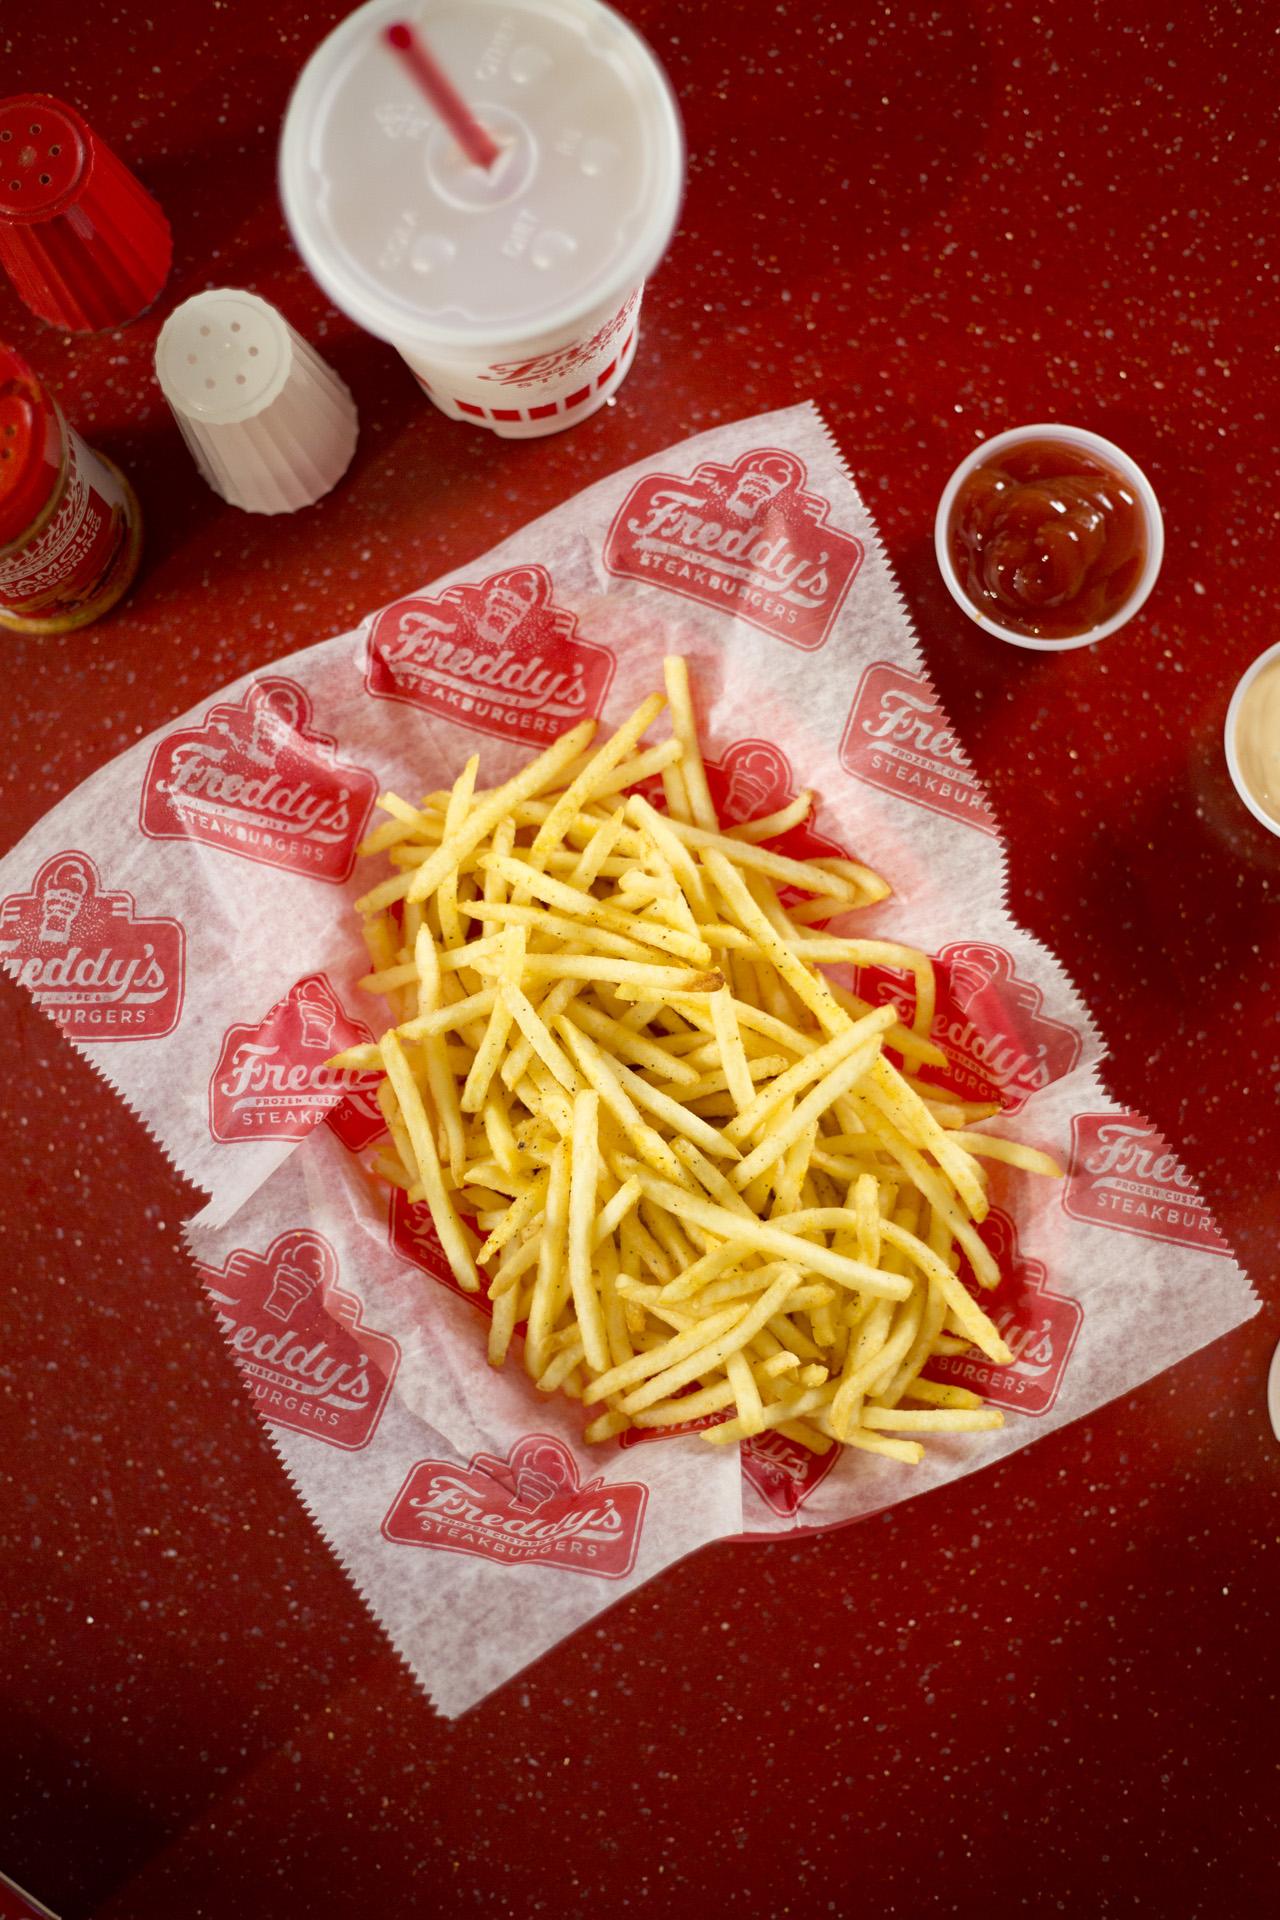 Freddy's Basket of Fries